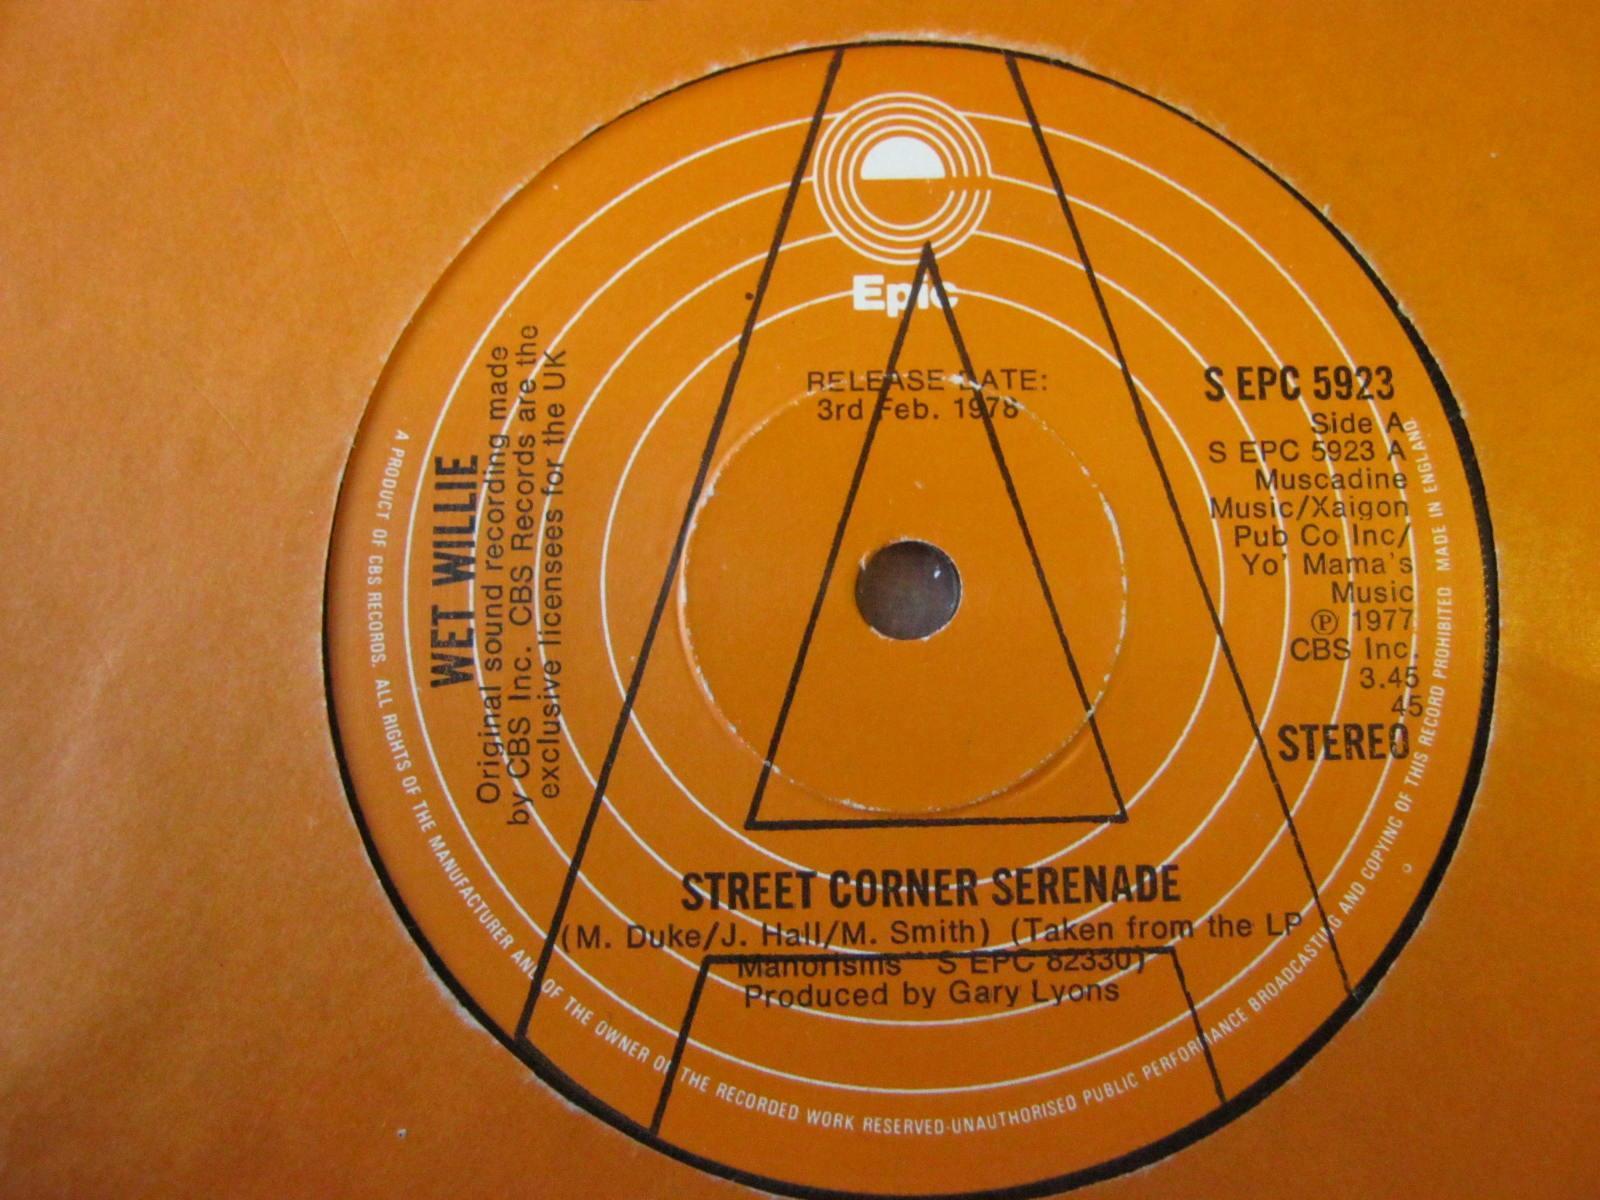 Street Corner Serenade